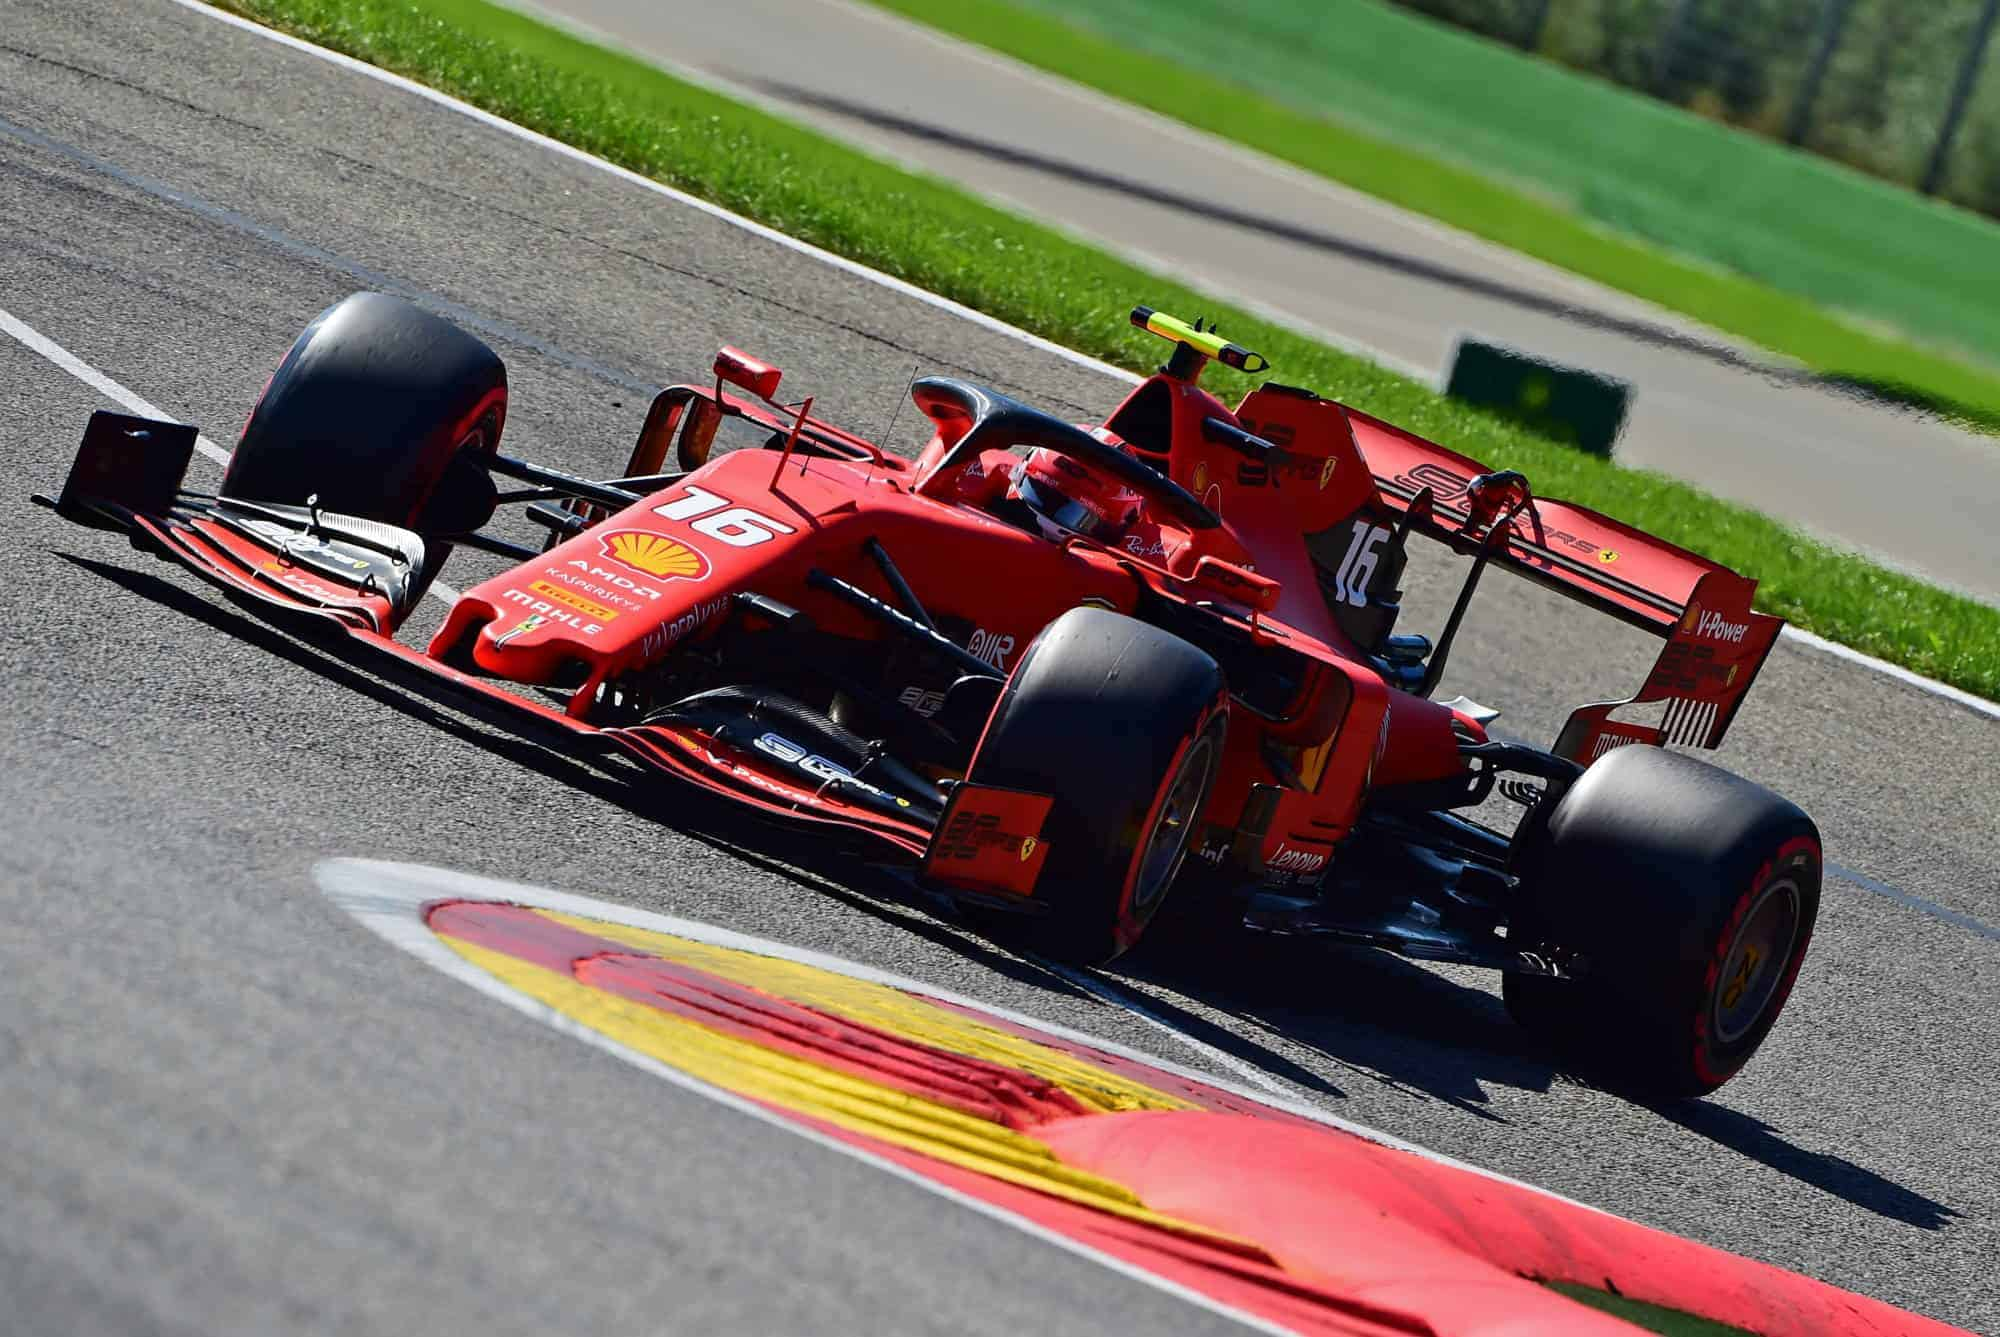 Charles Leclerc Ferrari Belgian GP F1 2019 Bus Stop Chicane Photo Ferrari